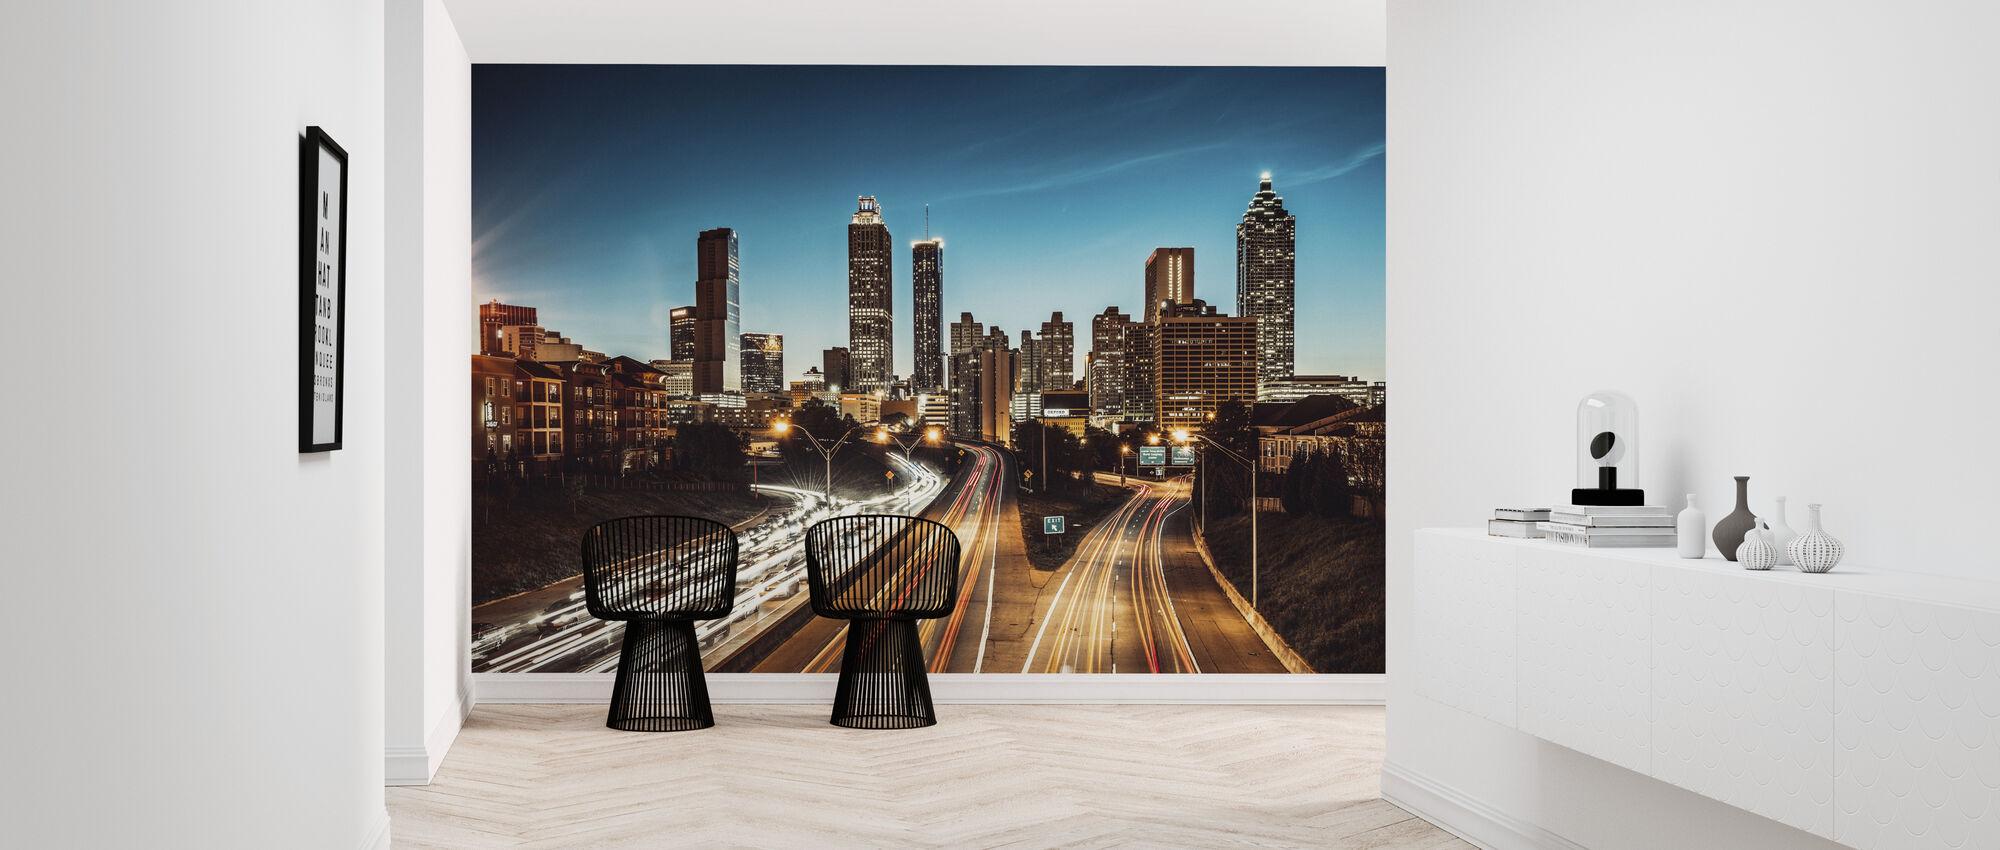 Atlanta Skyline at Dusk - Wallpaper - Hallway